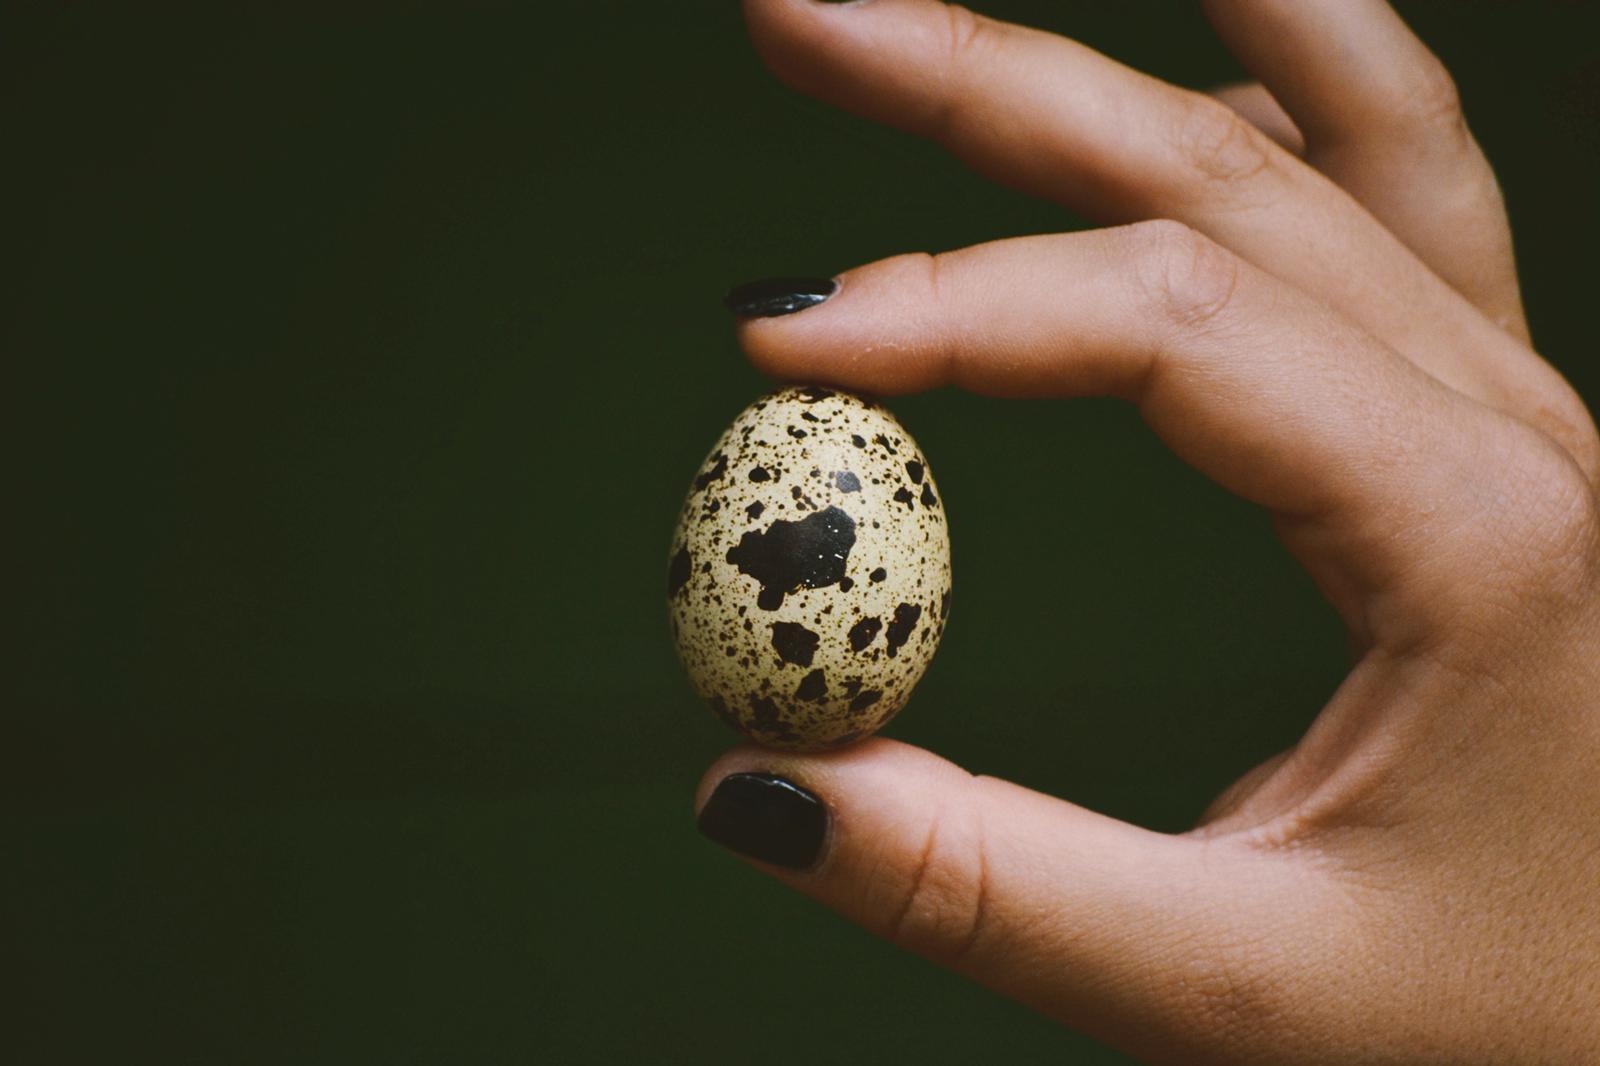 paipalu olas, veselīgs dzīvesveids